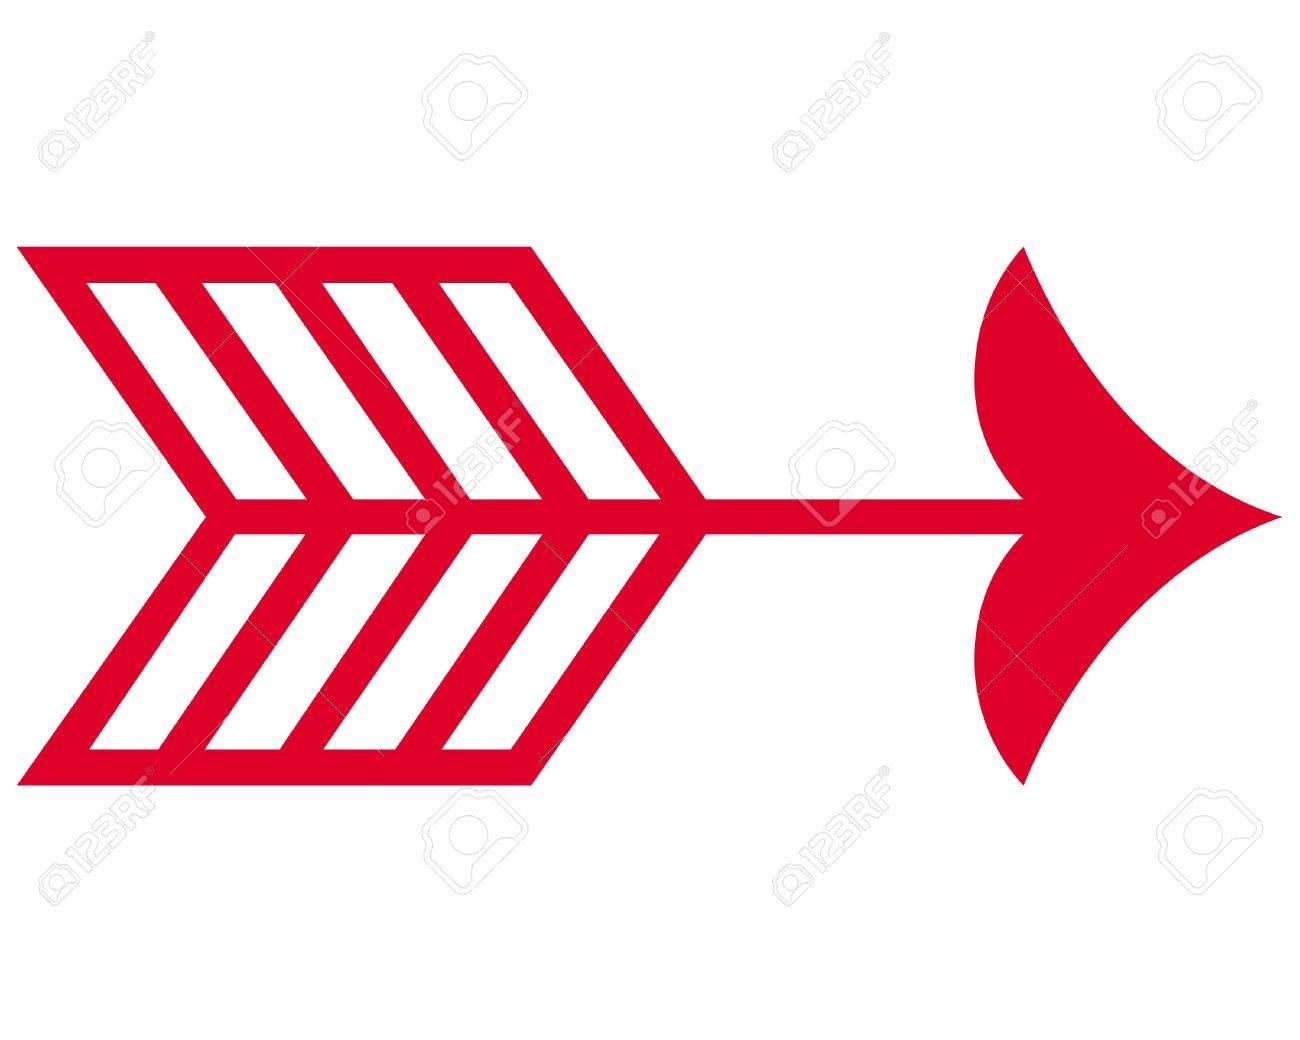 Red Arrowhead Logo art arrowhead Arrow symbol